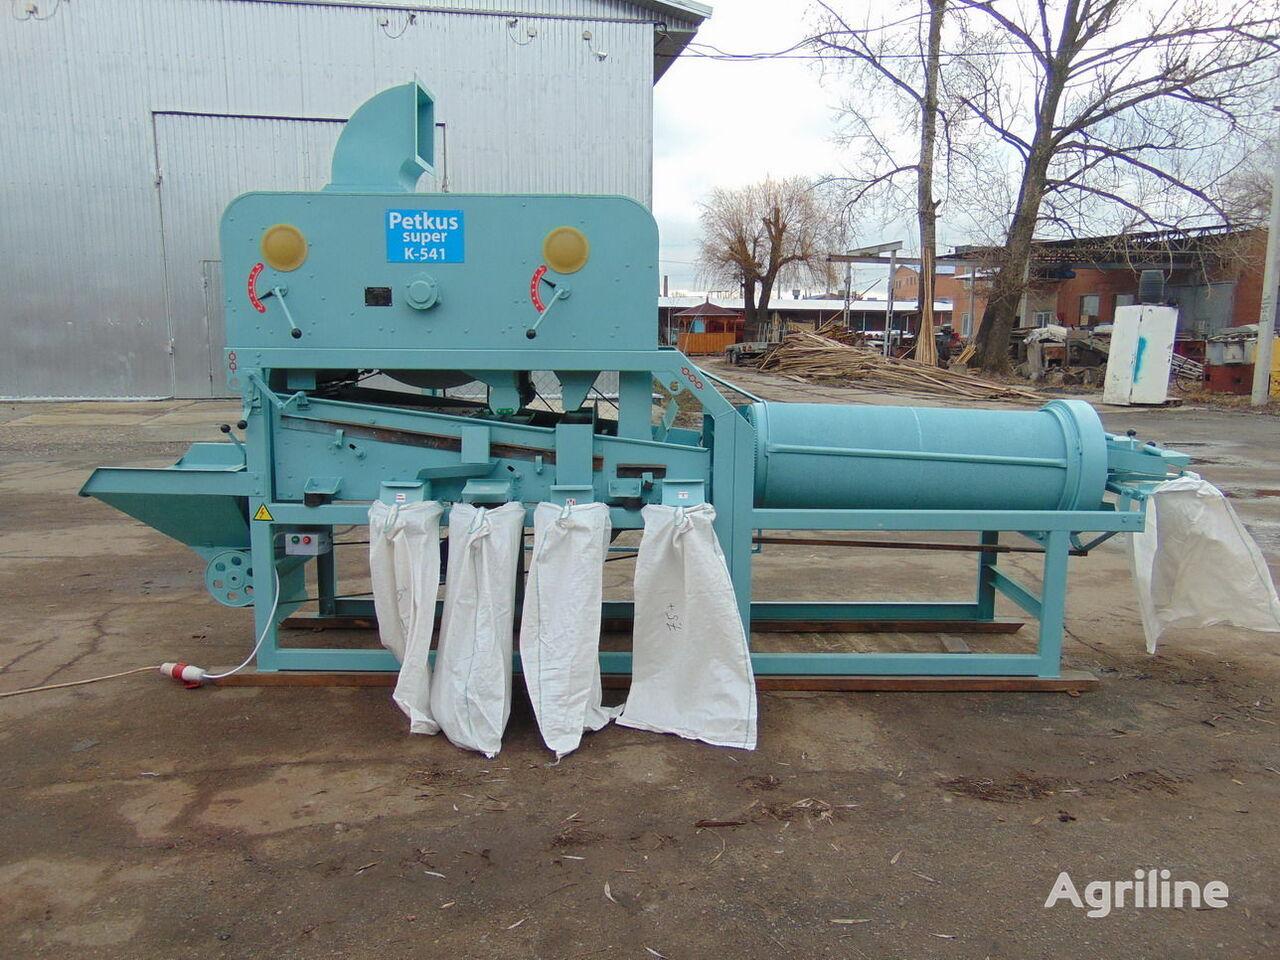 PETKUS K-541 grain cleaner